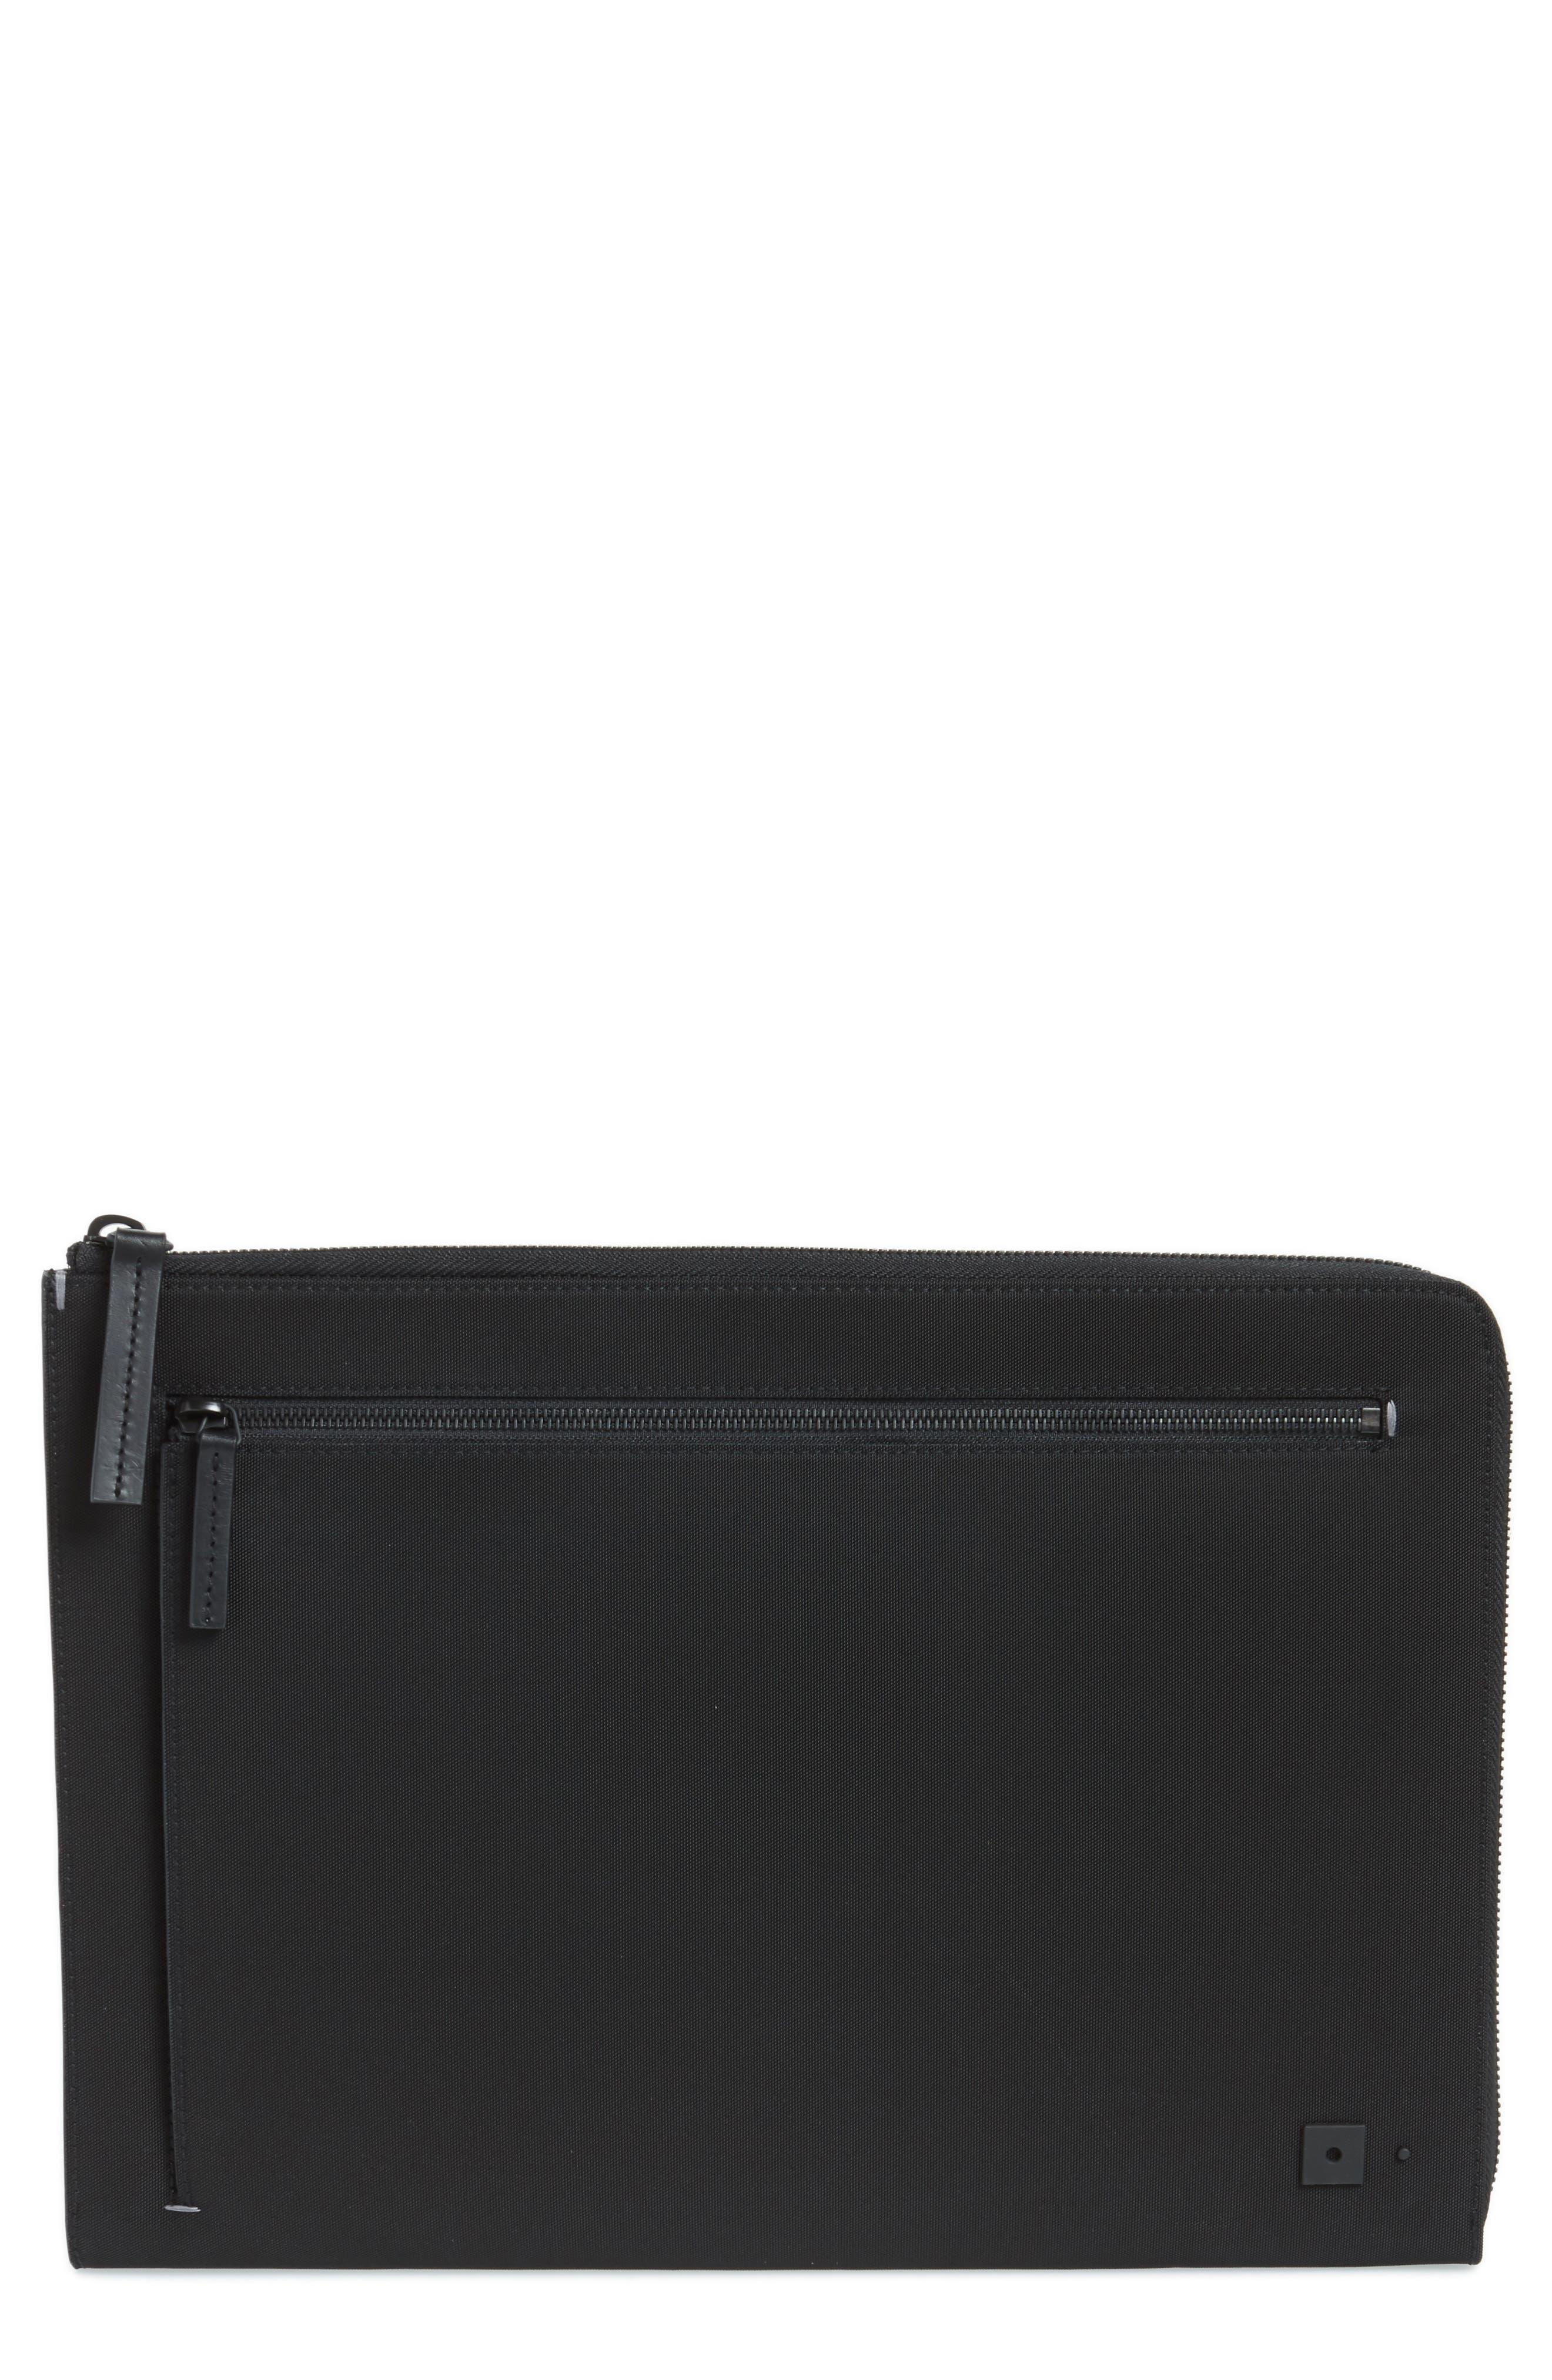 Portfolio Case,                             Main thumbnail 1, color,                             Black Nylon/ Black Leather